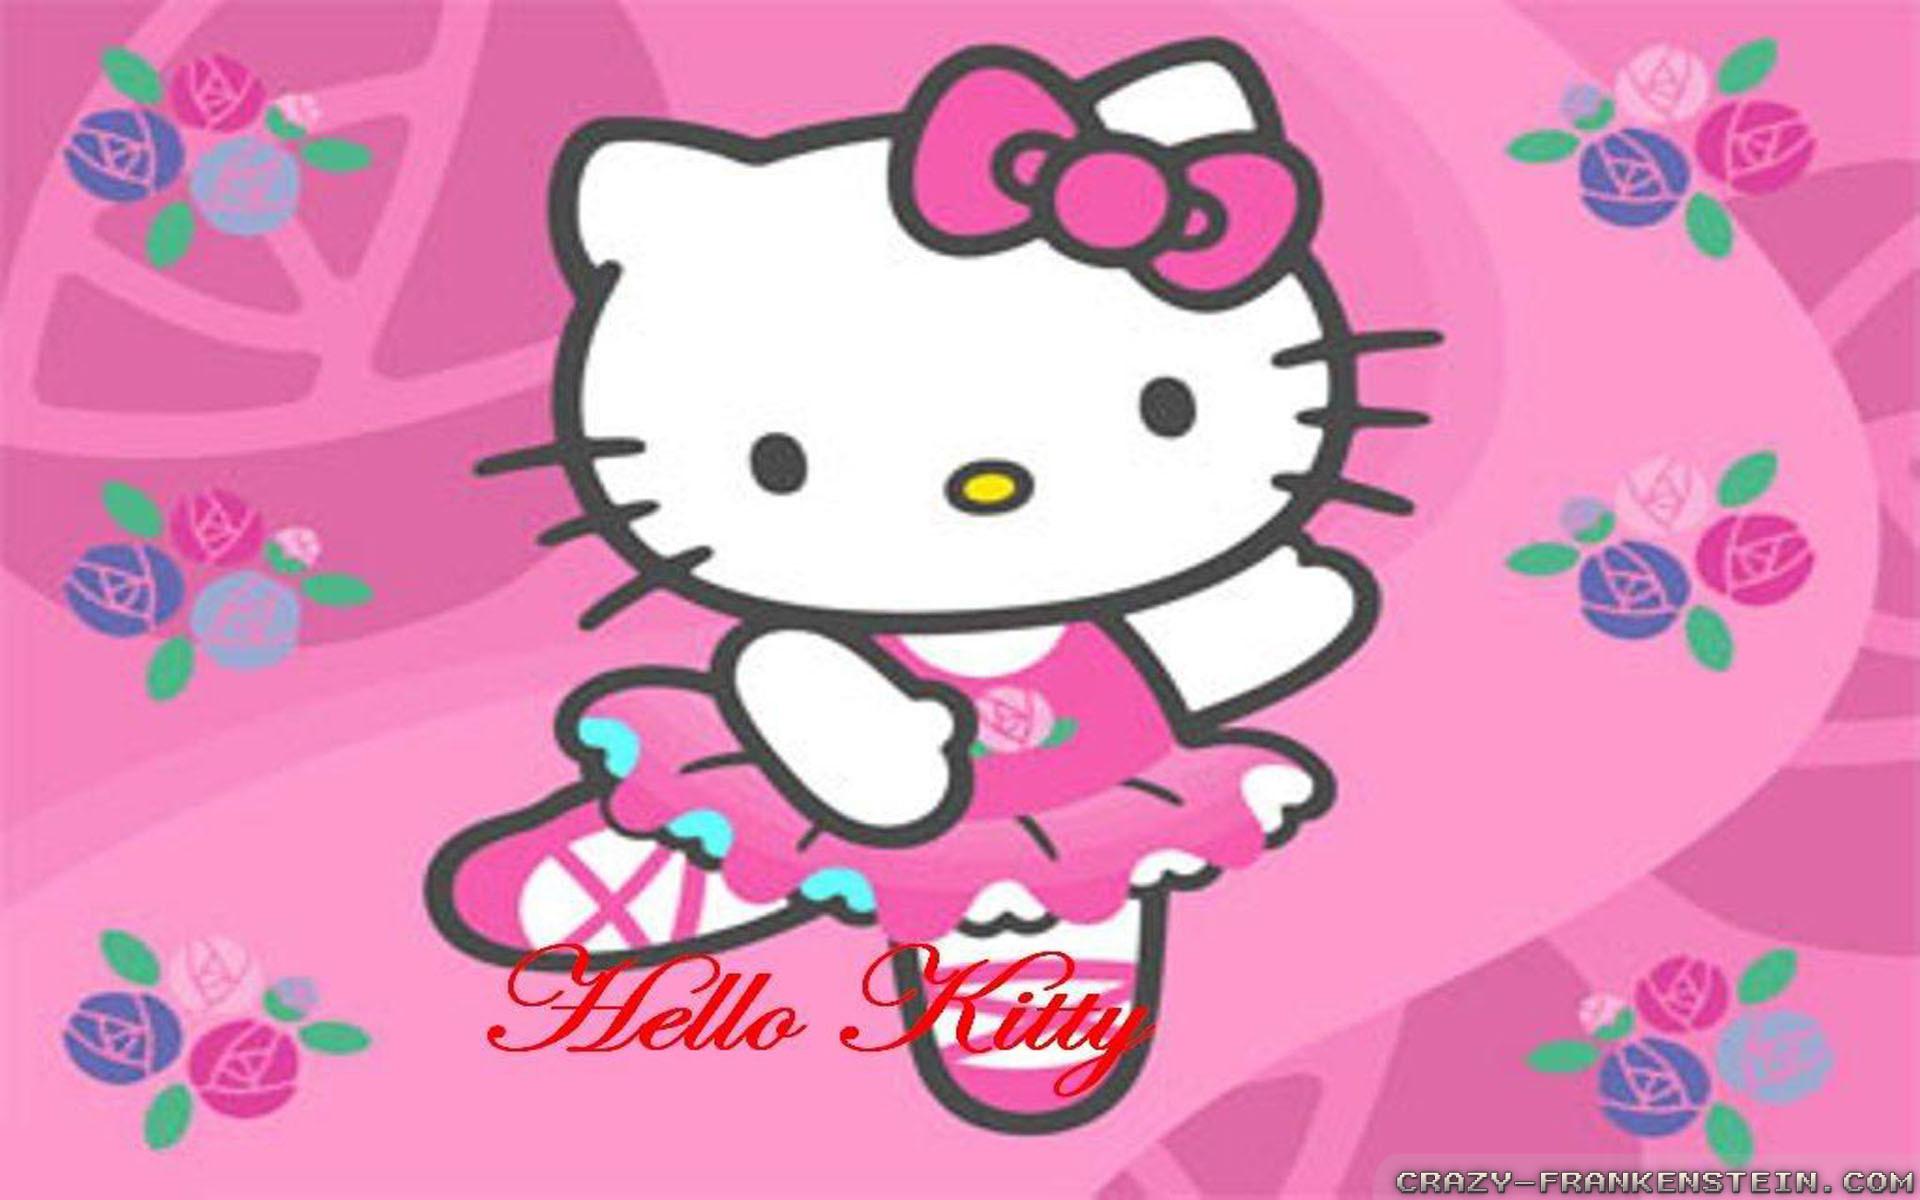 Amazing Wallpaper High Resolution Hello Kitty - 610361-download-free-hello-kitty-spring-wallpaper-1920x1200  2018_16398.jpg